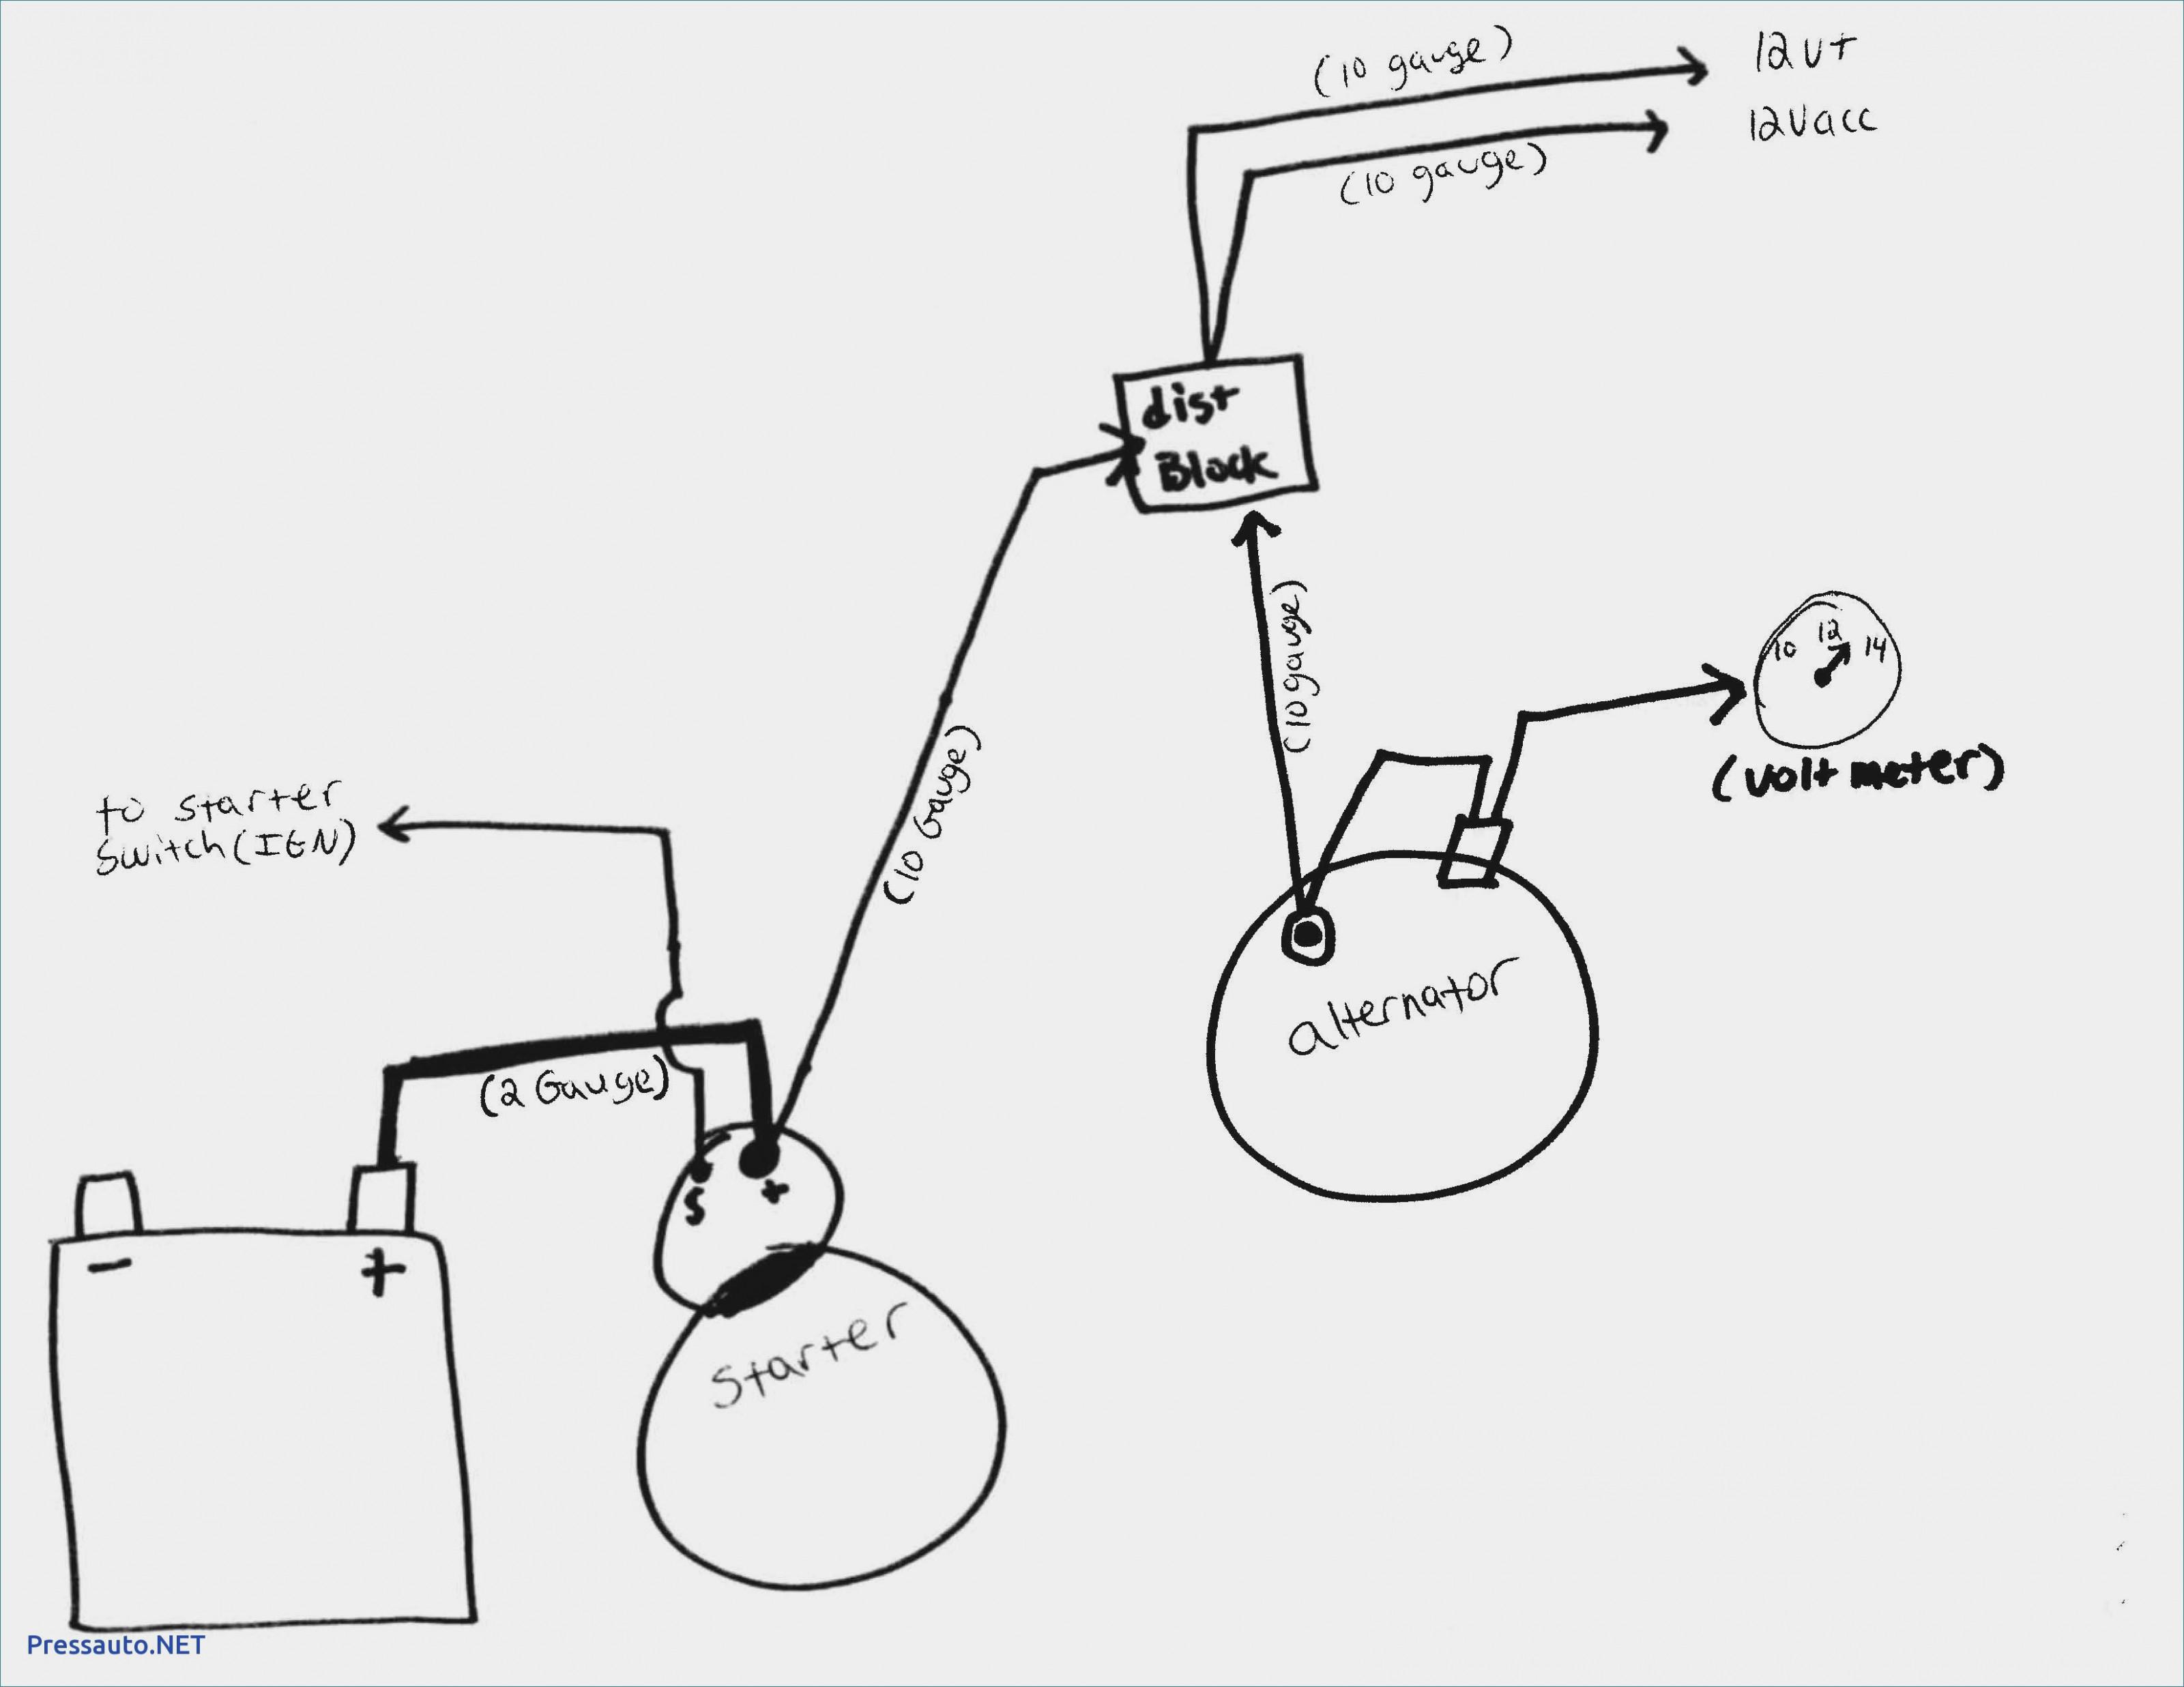 Gm 12si Alternator Wiring Diagram